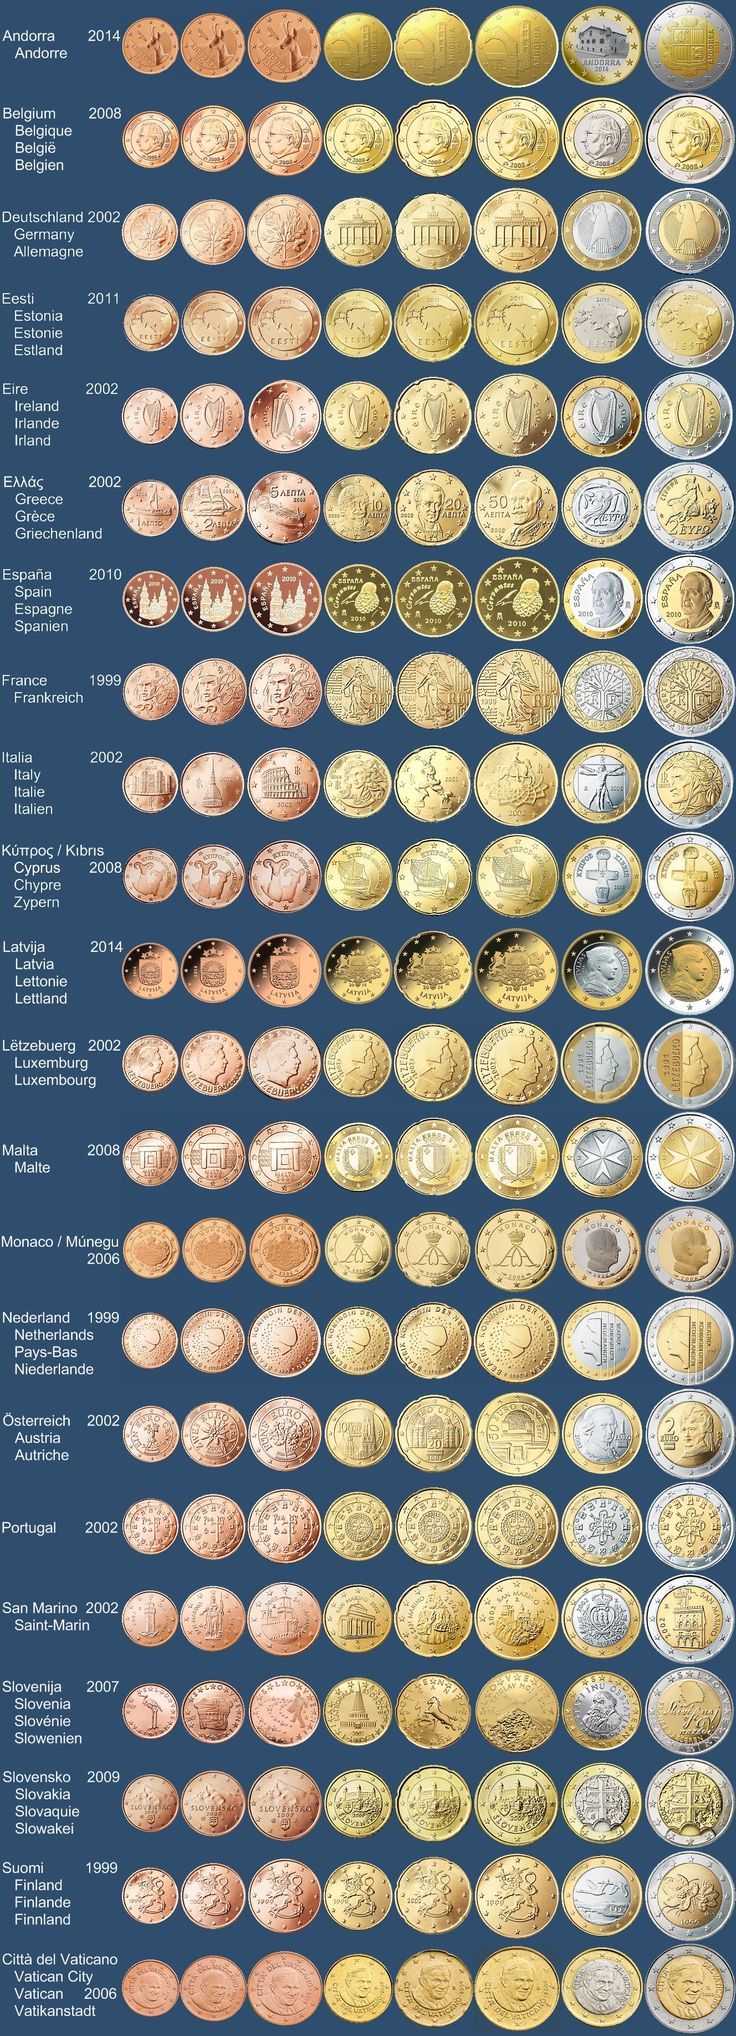 Coins#numismatics#cool#fun